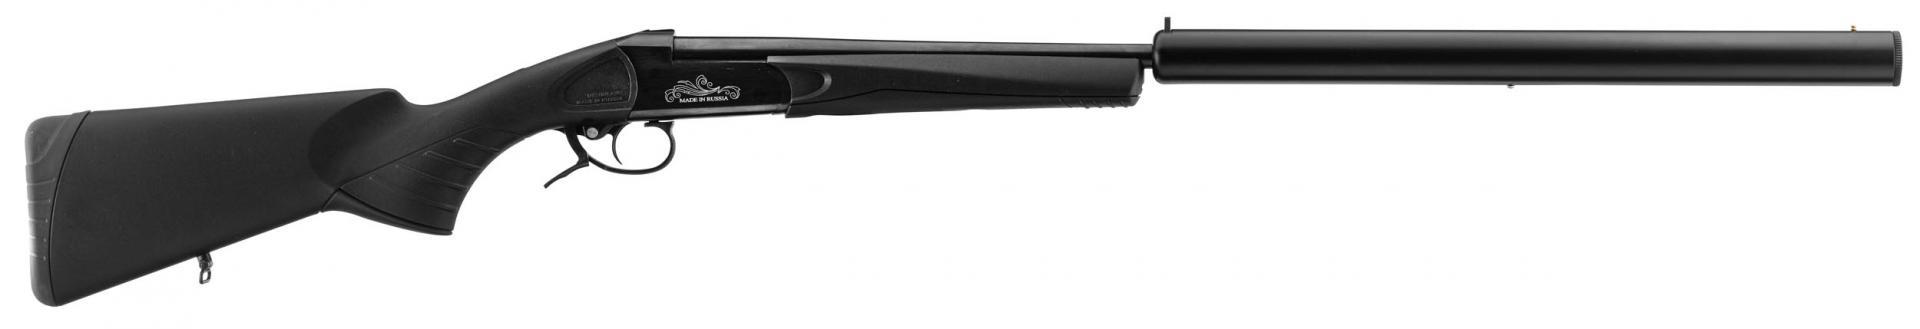 Ba141s 2